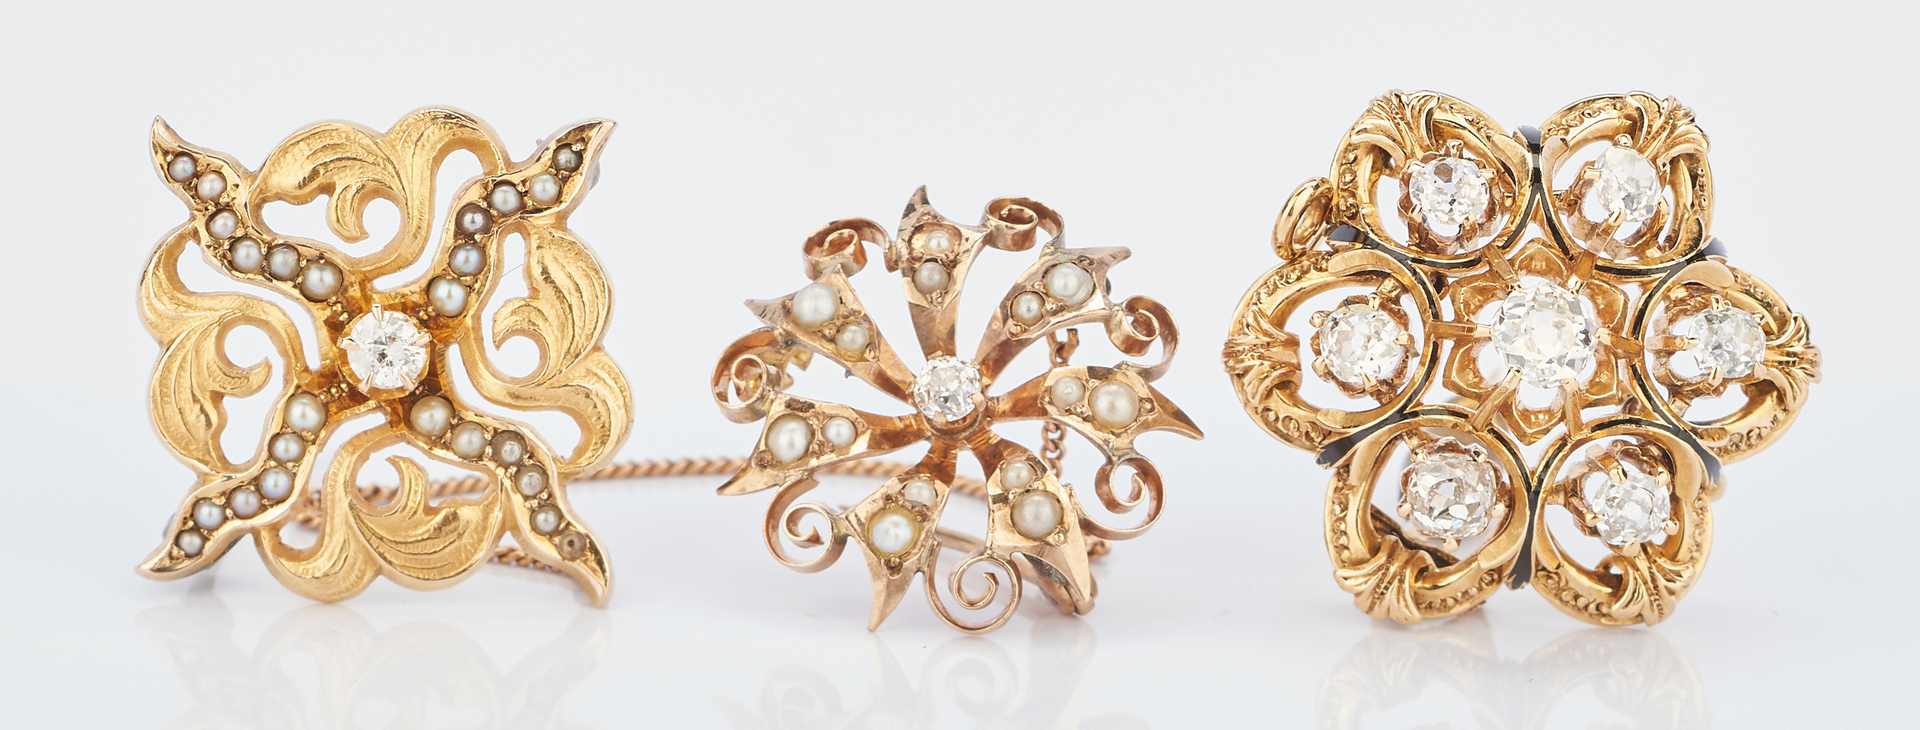 Lot 773: 3 Victorian Gold & Diamond Ladies Pins